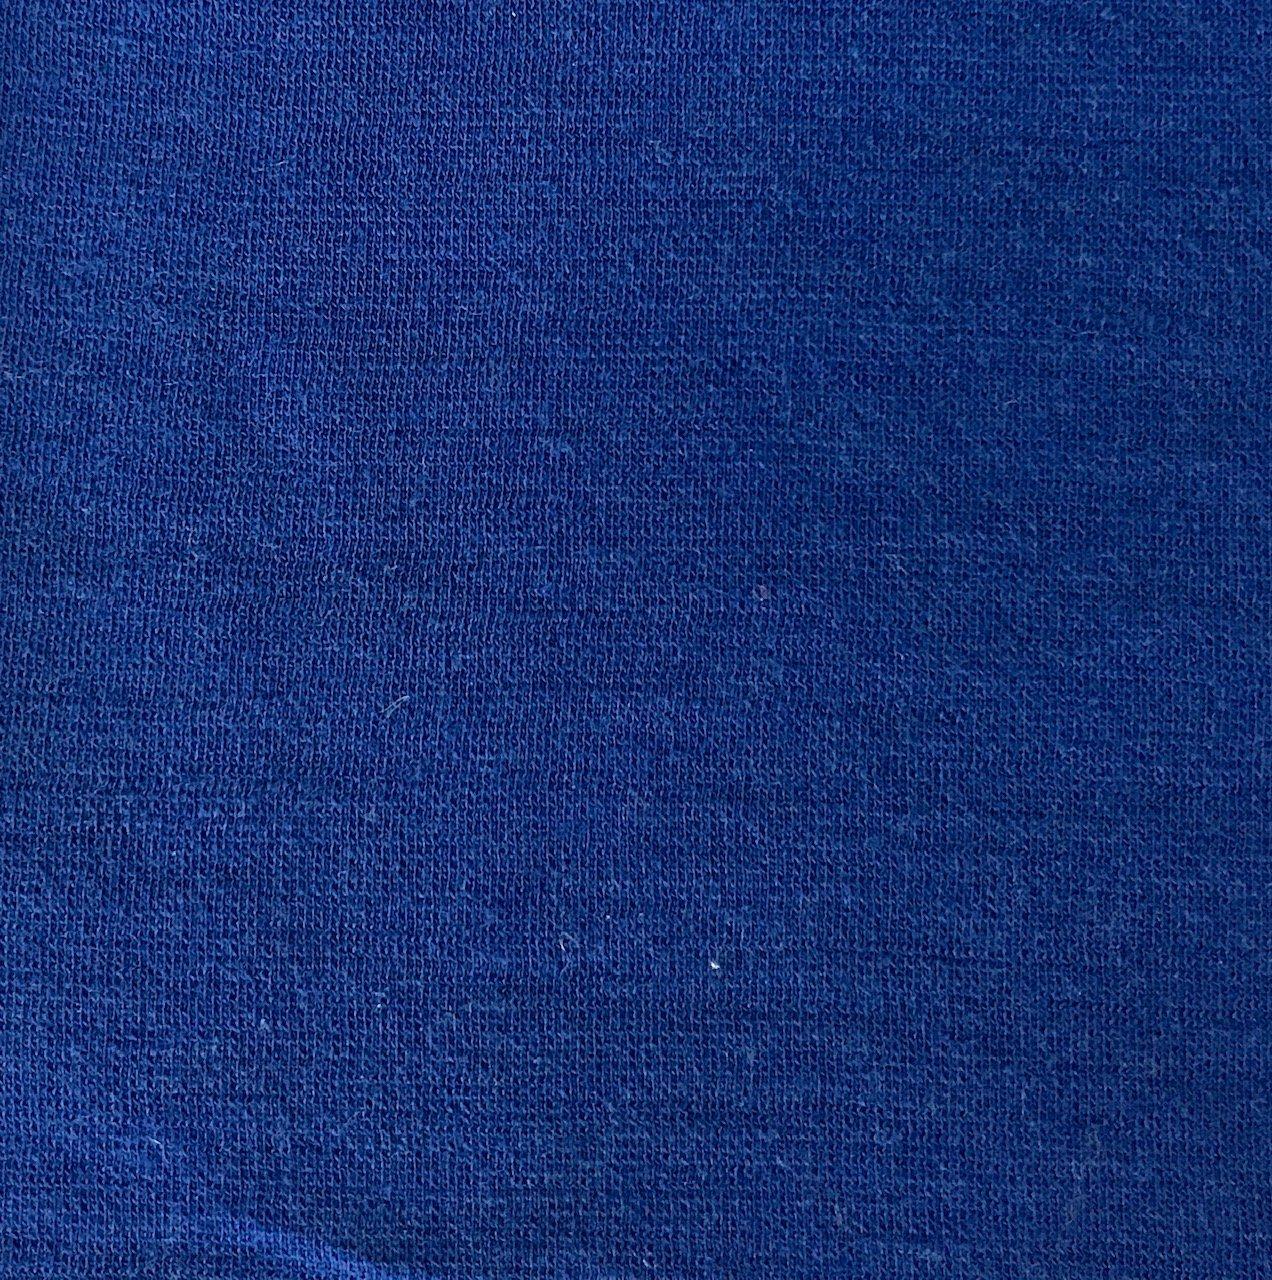 Merino Wool/Viscose - Royal Blue